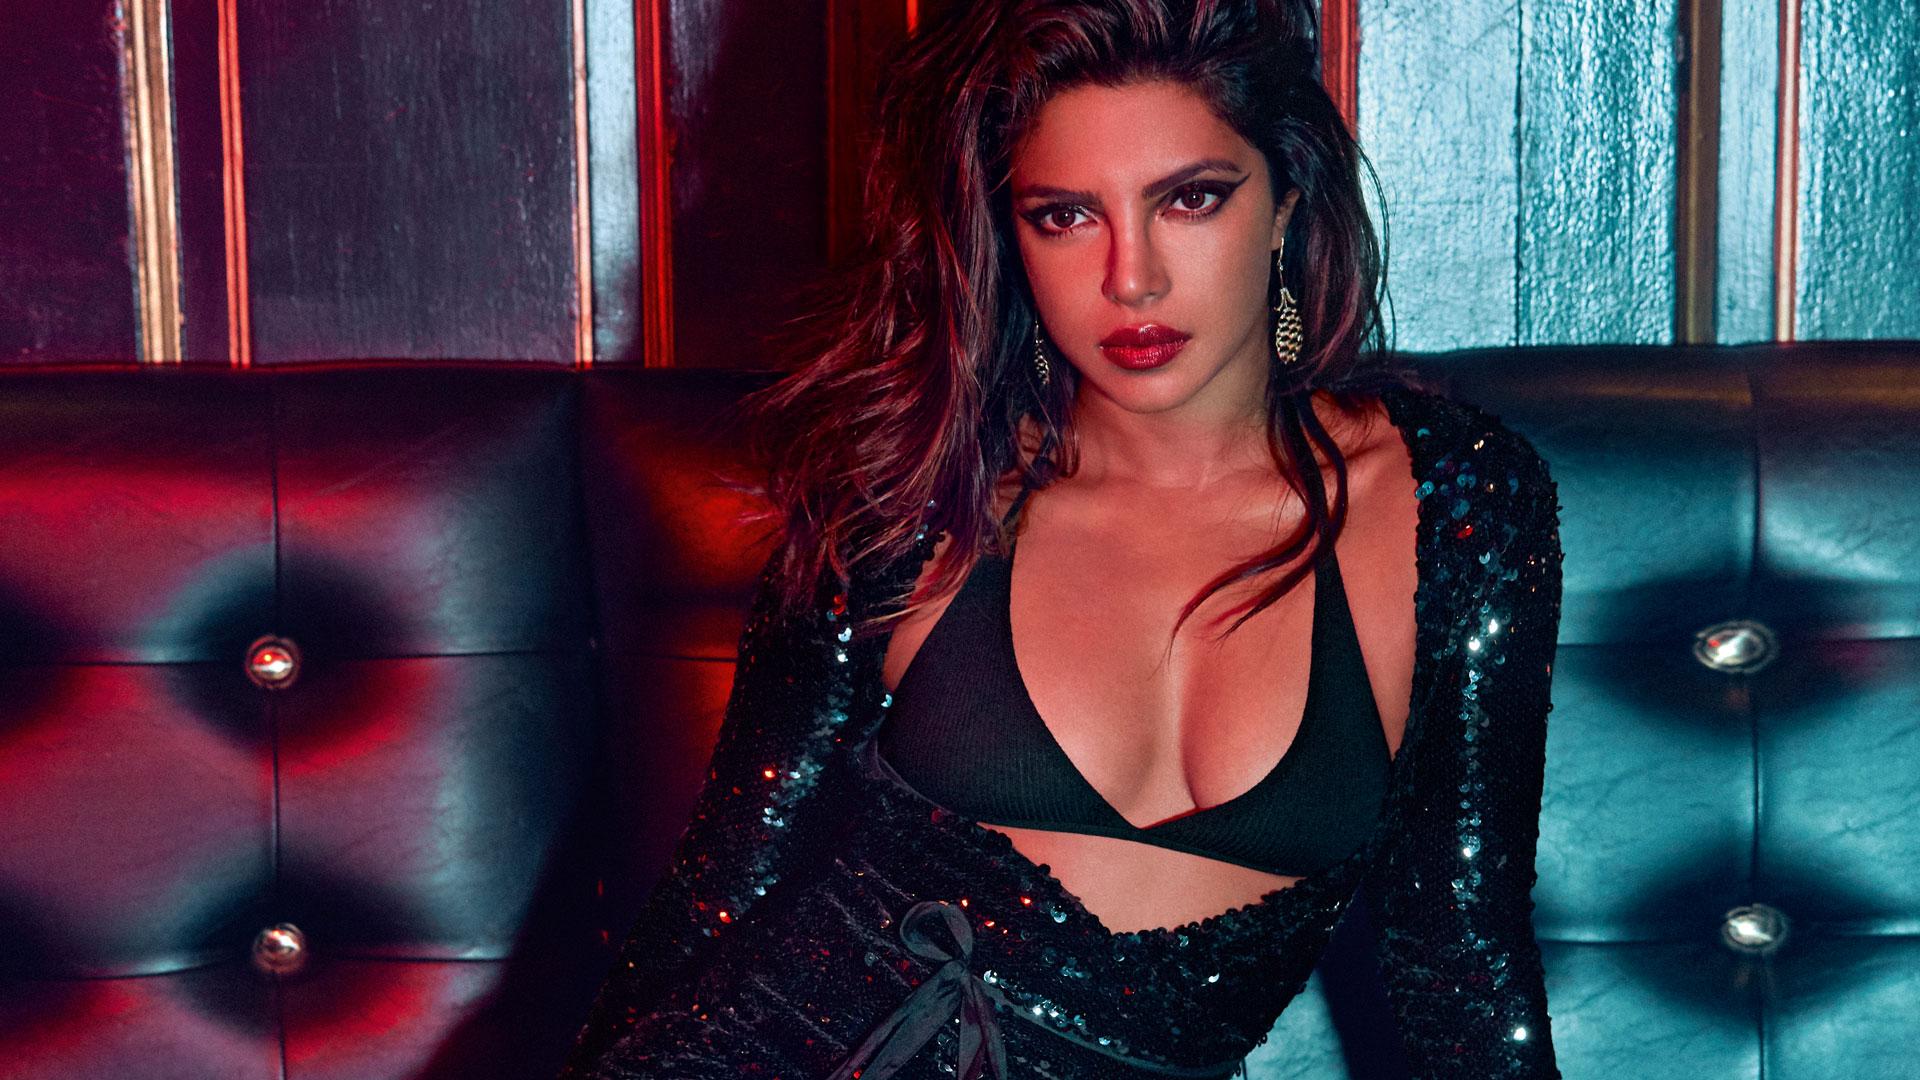 Priyanka-Chopra-sexiest-Asia-woman